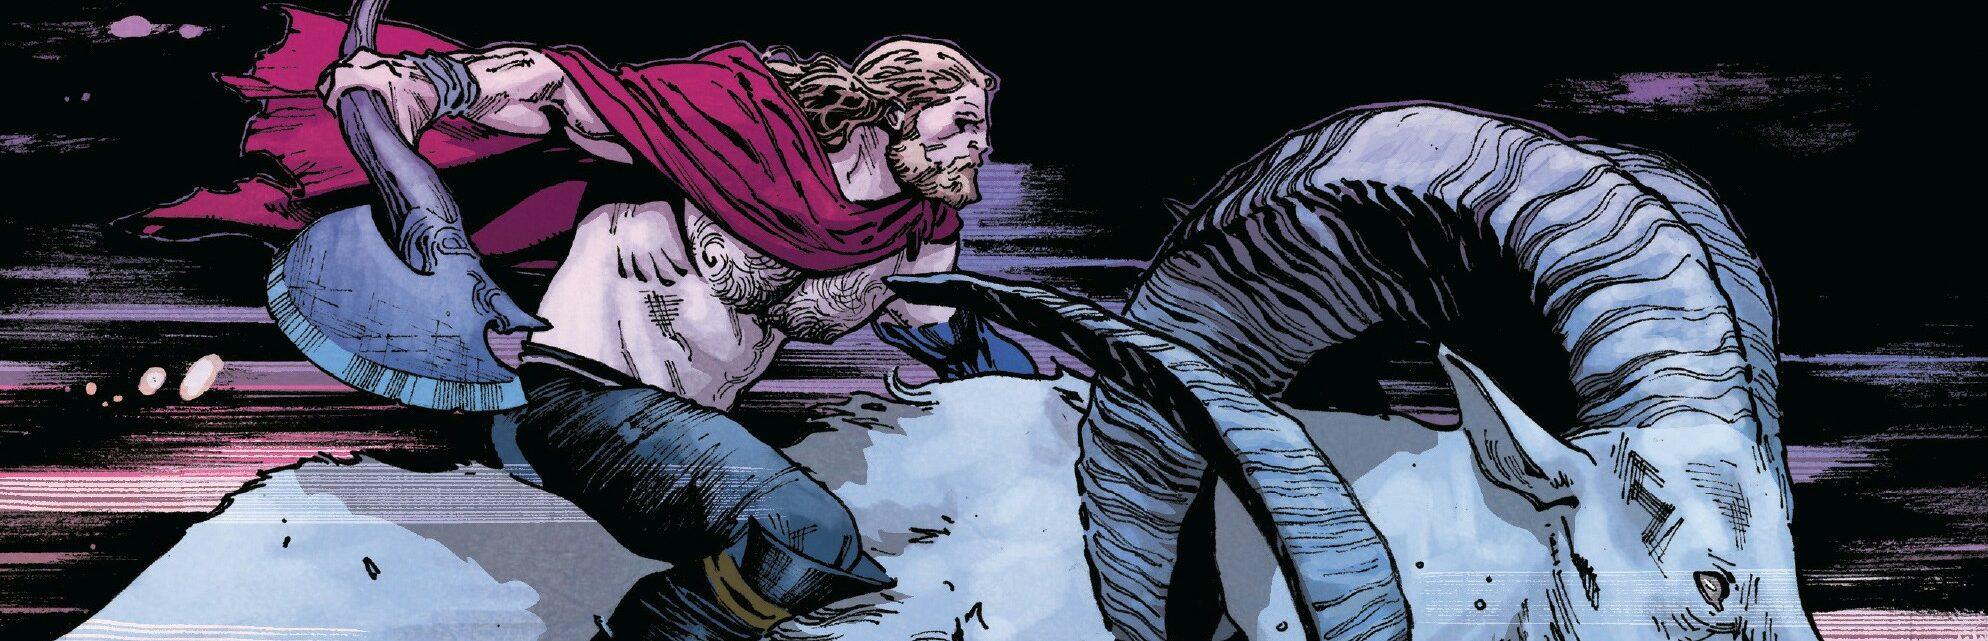 The Unworthy Thor 001-017_2